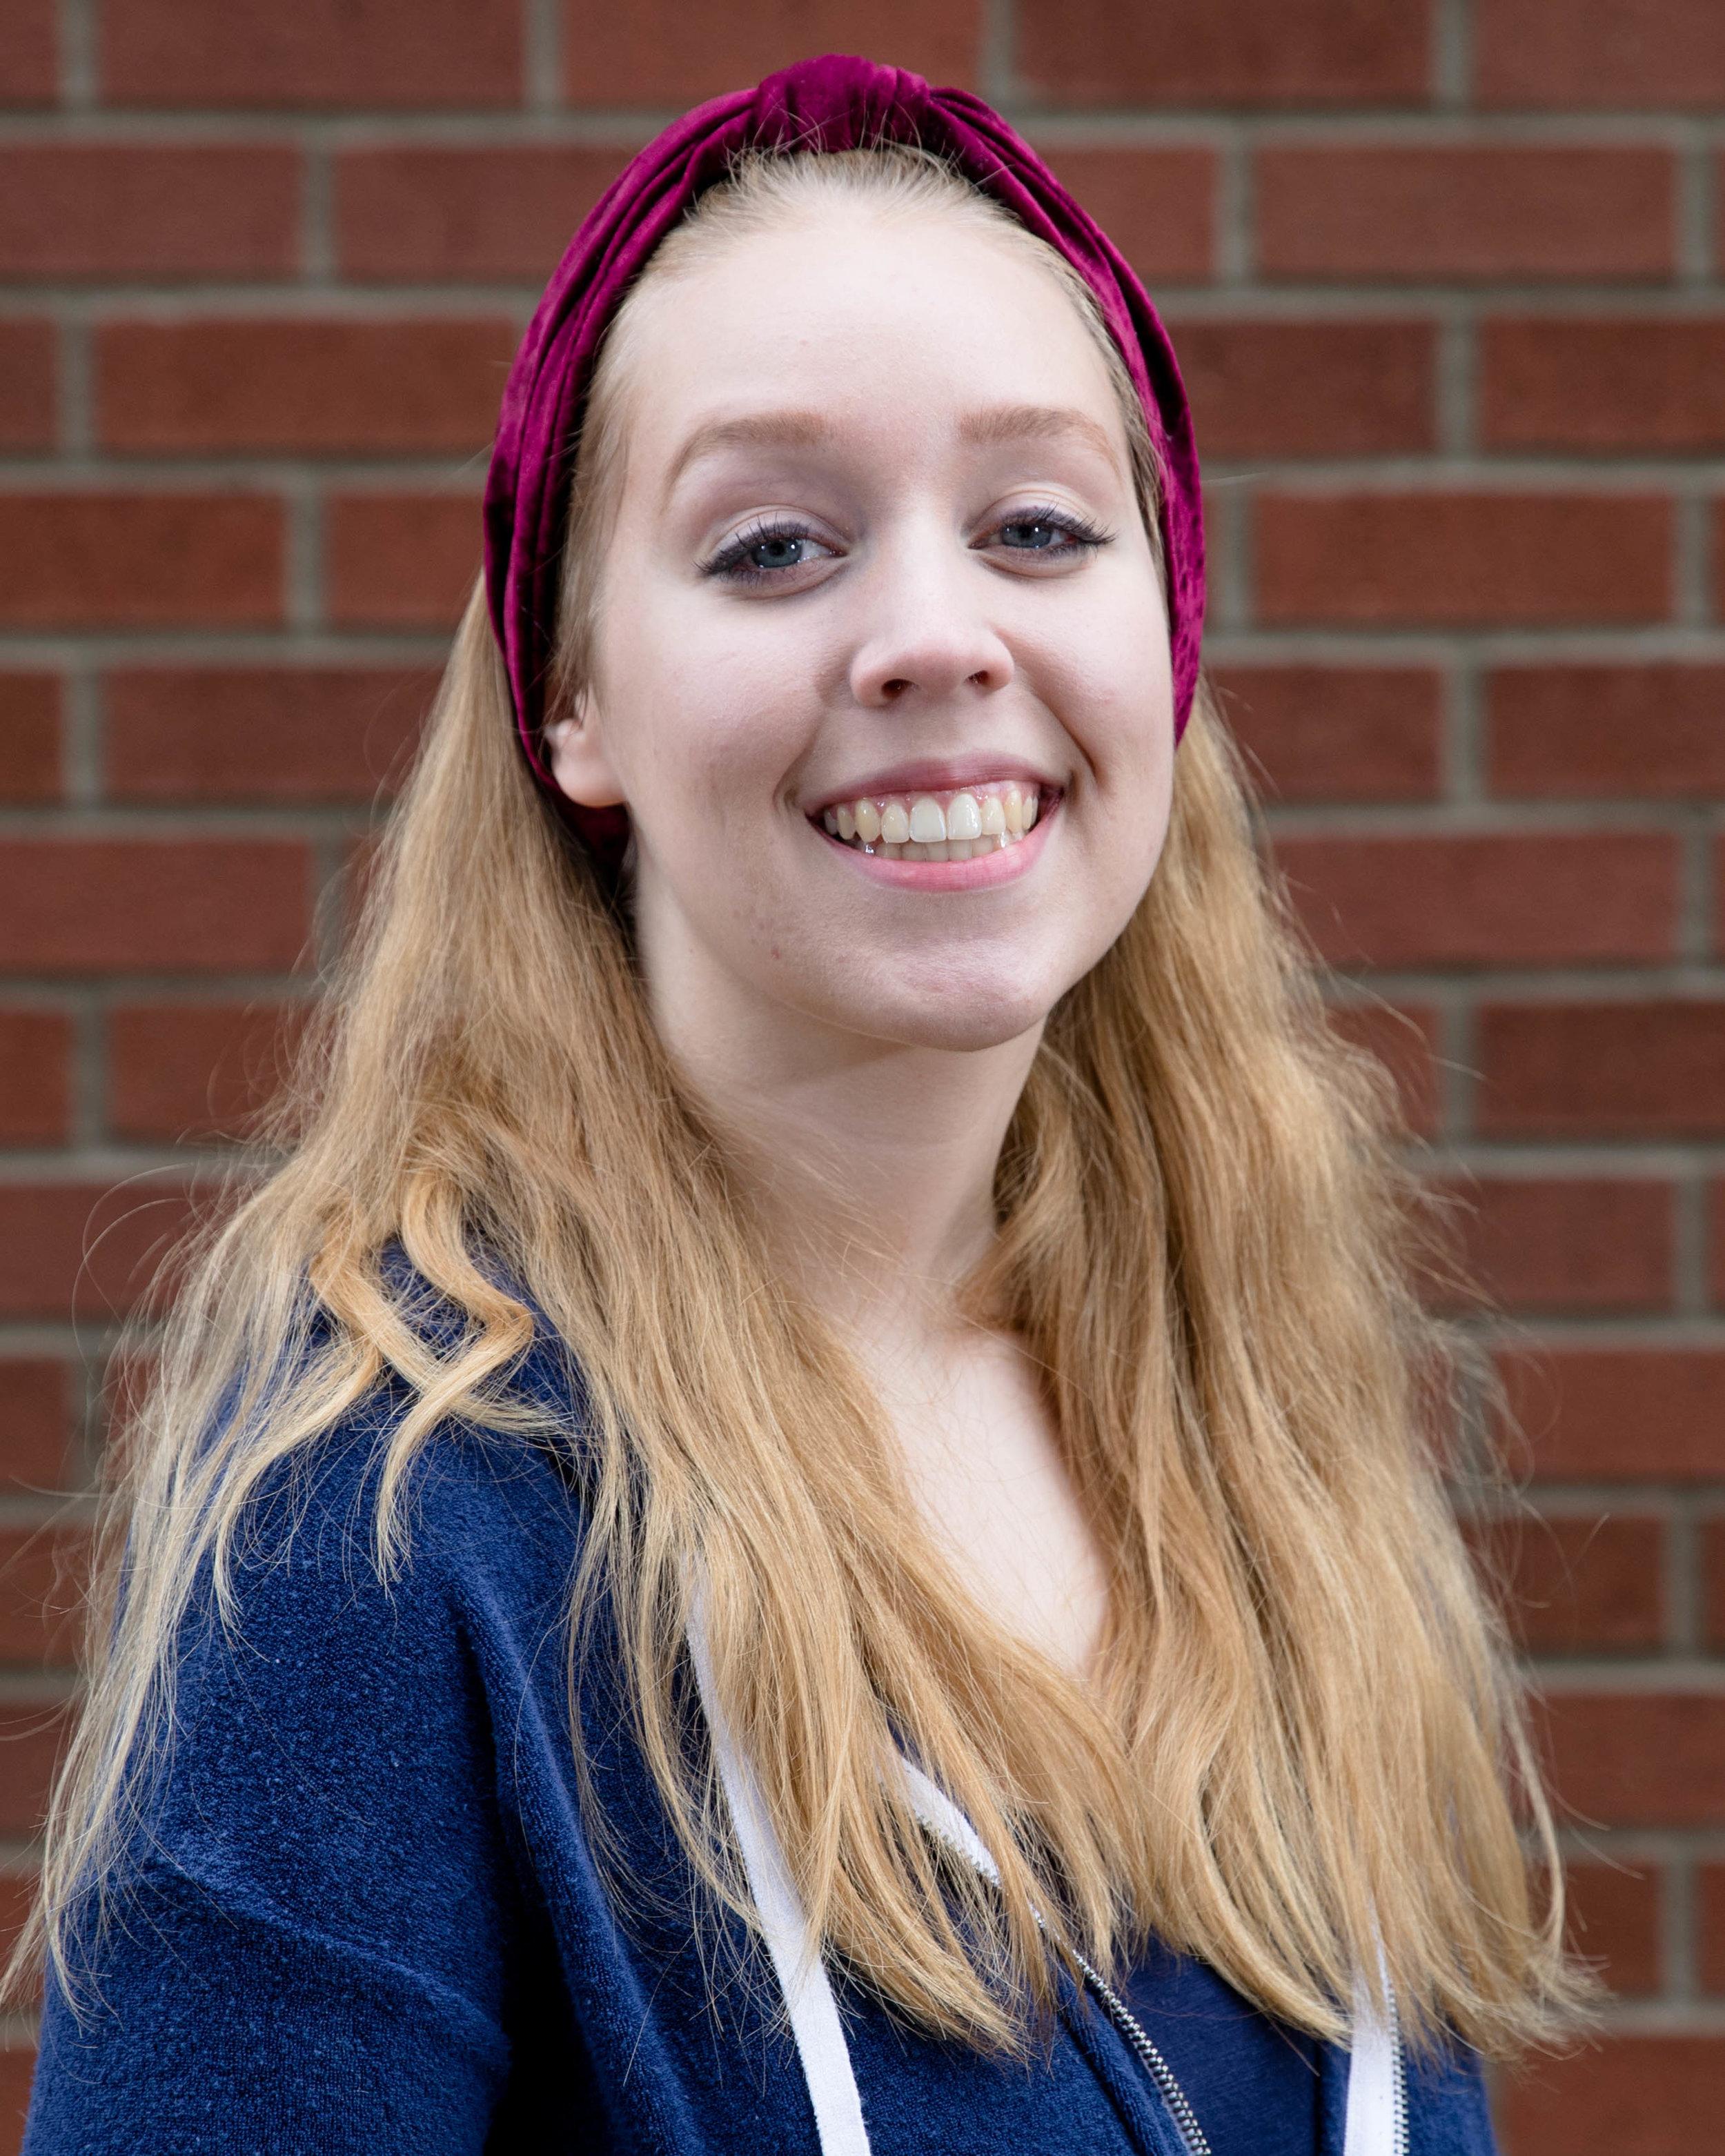 PULSE Video Producer | Jocelyn Waite